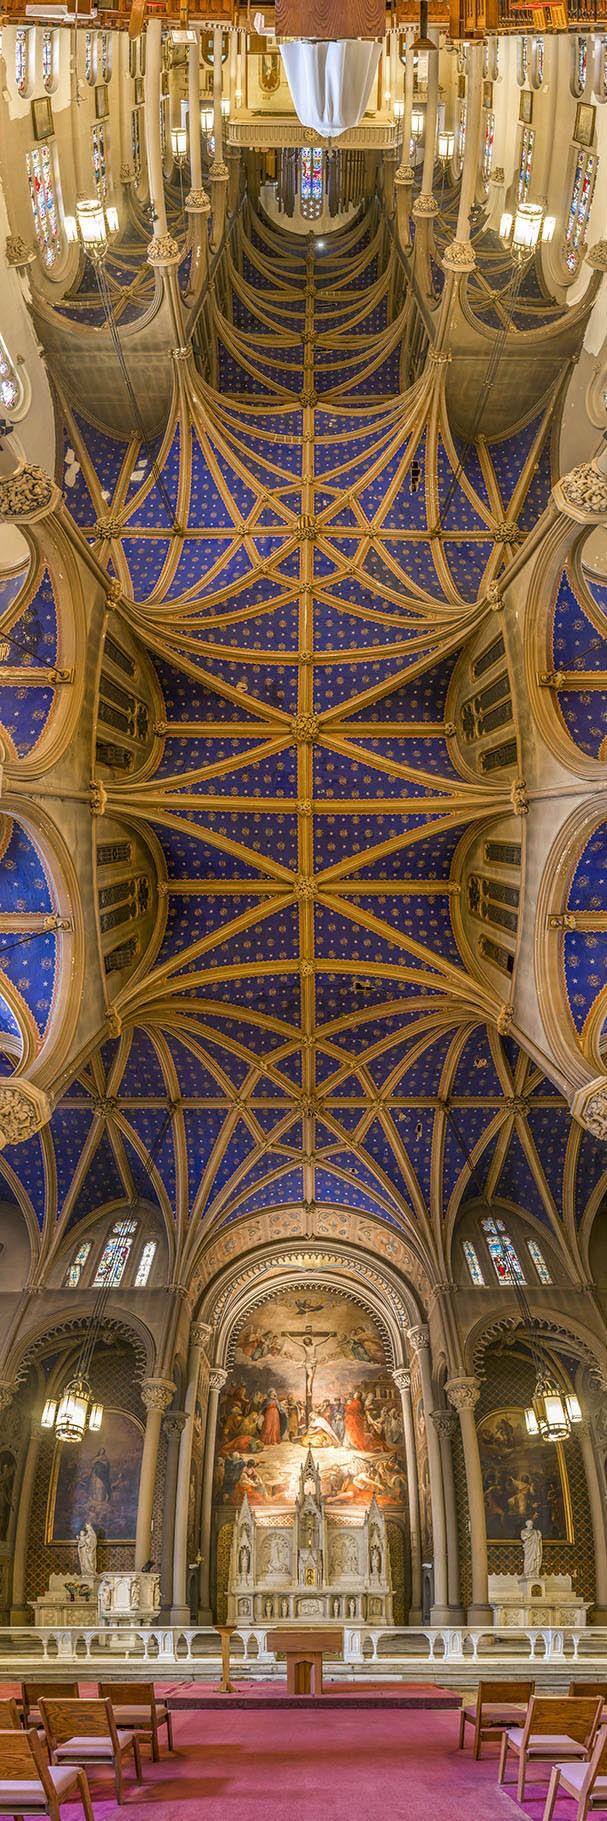 Vertical Churches (Foto: Richard Silver / divulgação)